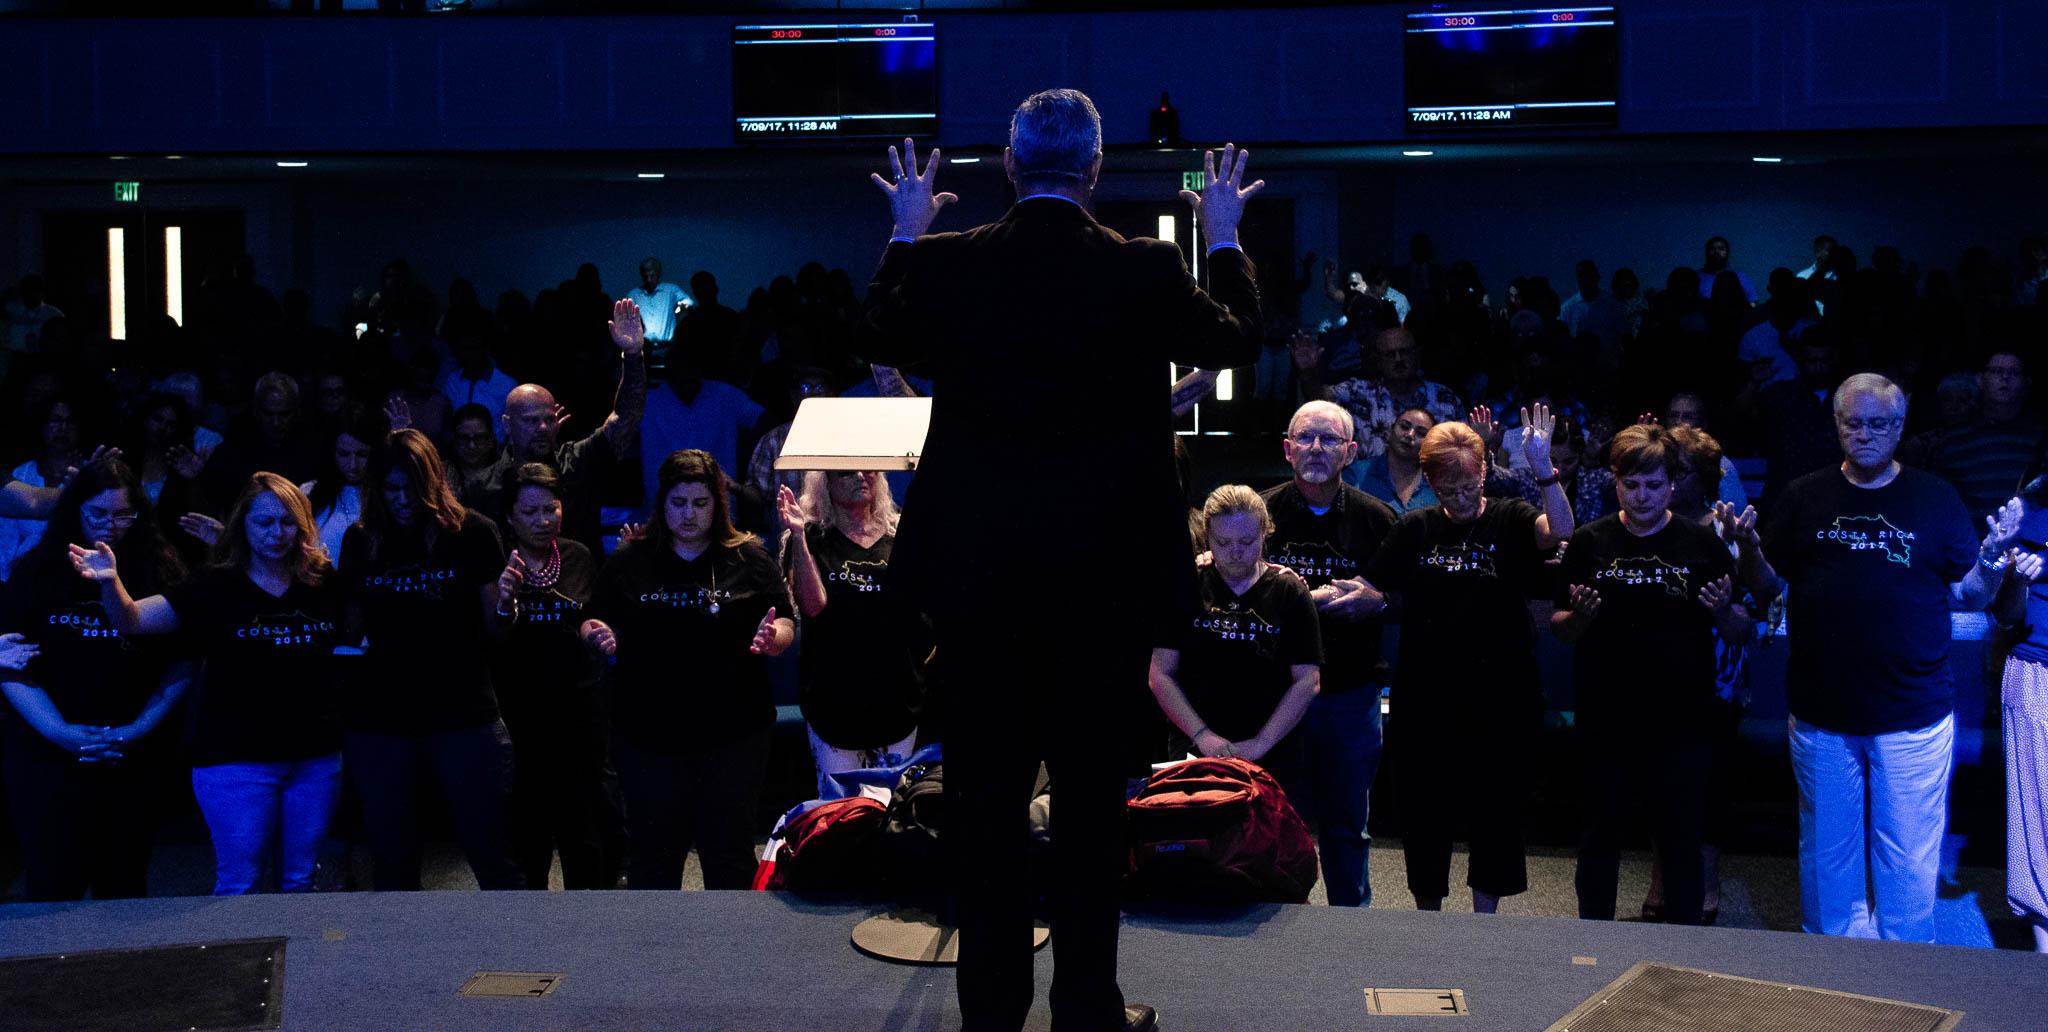 Pastor_praying_for_people_at_altar